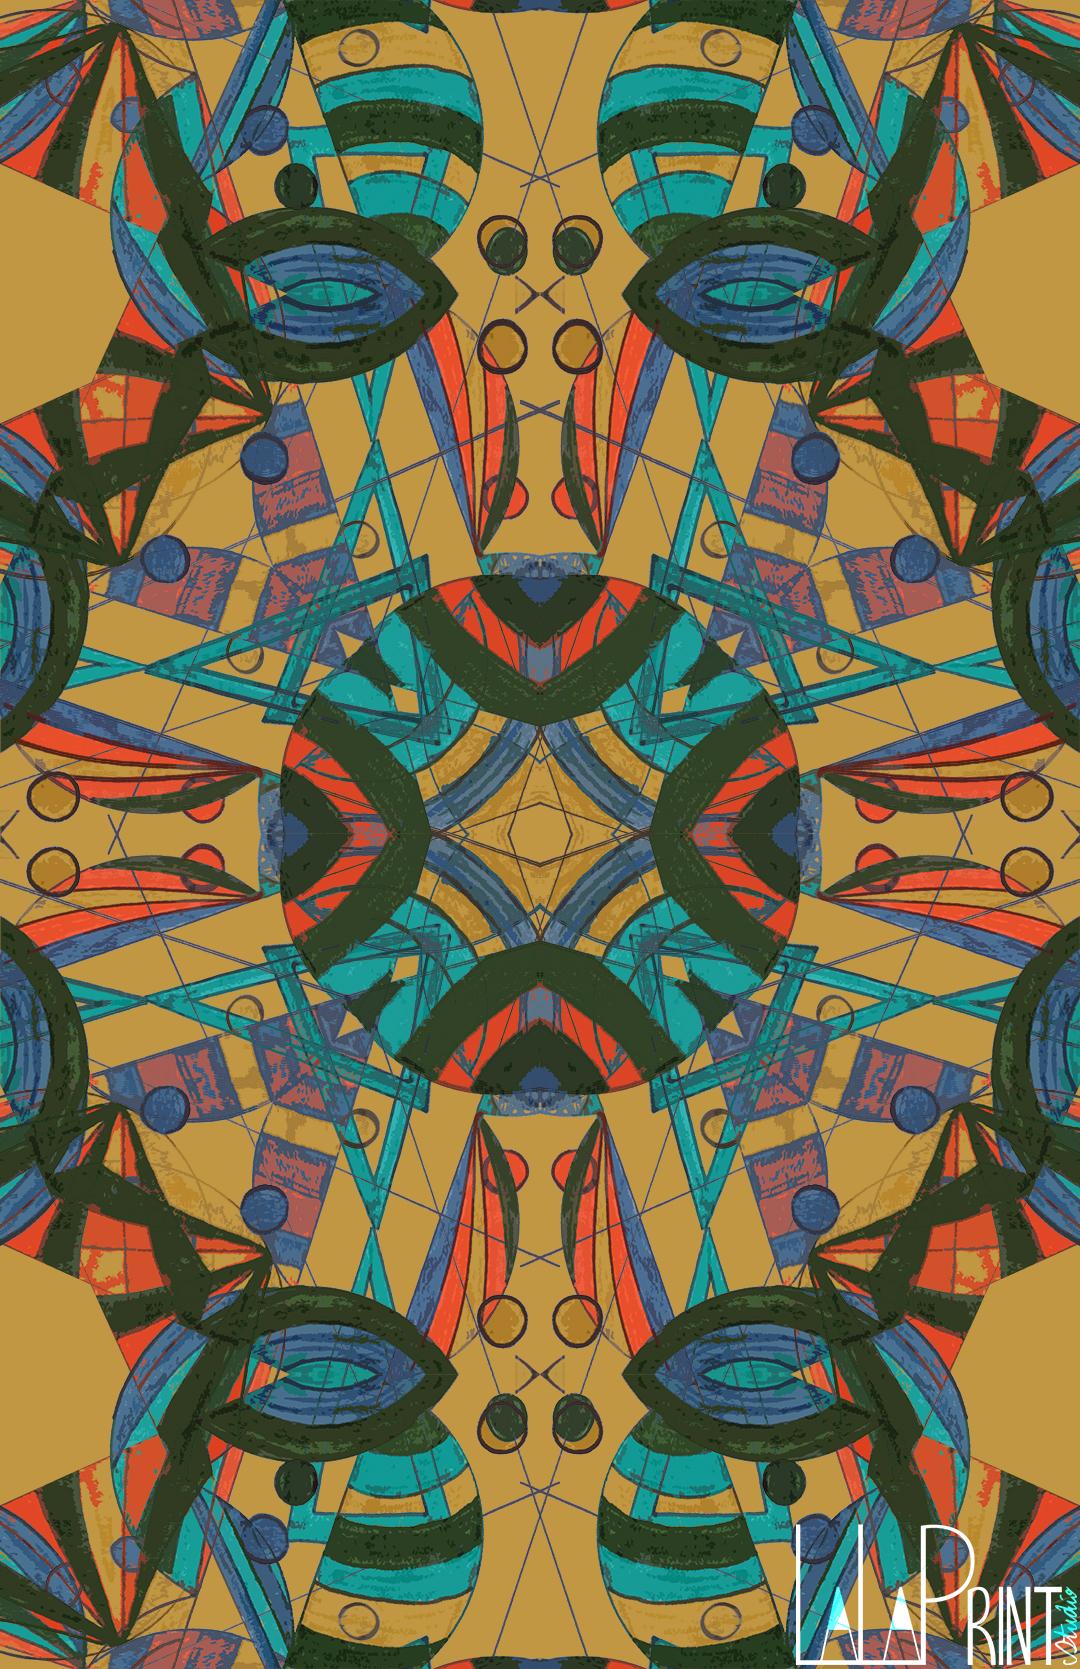 Lala Print Studio featured on Pattern Observer https://patternobserver.com/2016/08/04/lala-print-studio/